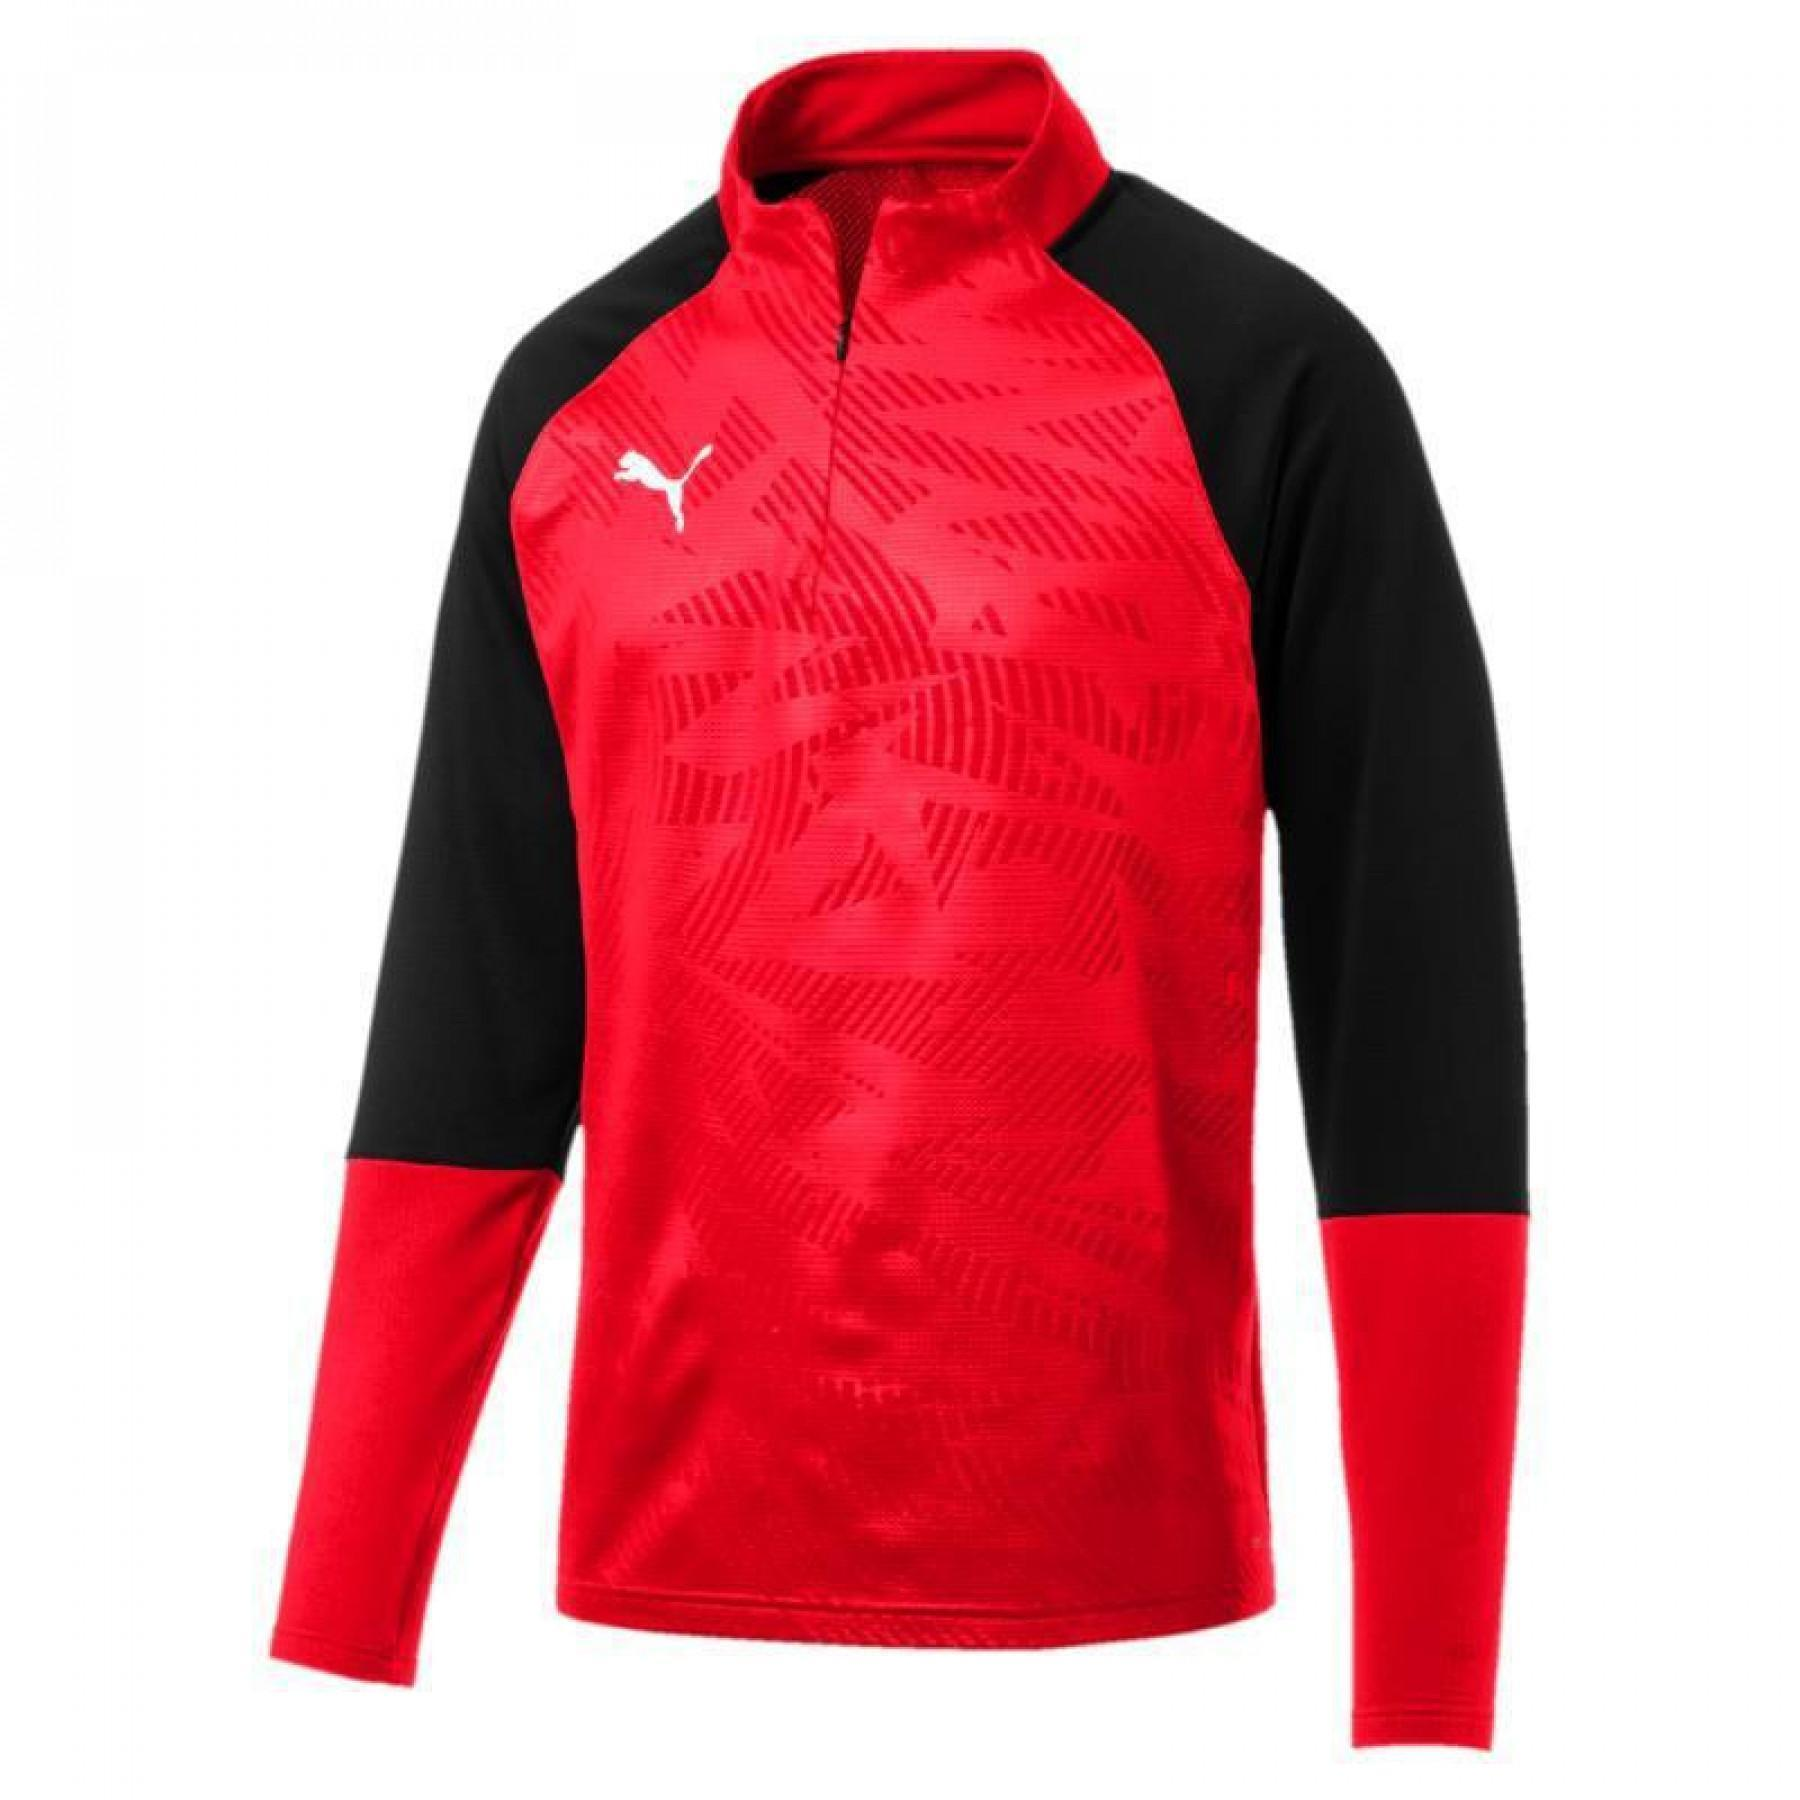 Puma training sweatshirt 1/4 zip CUP